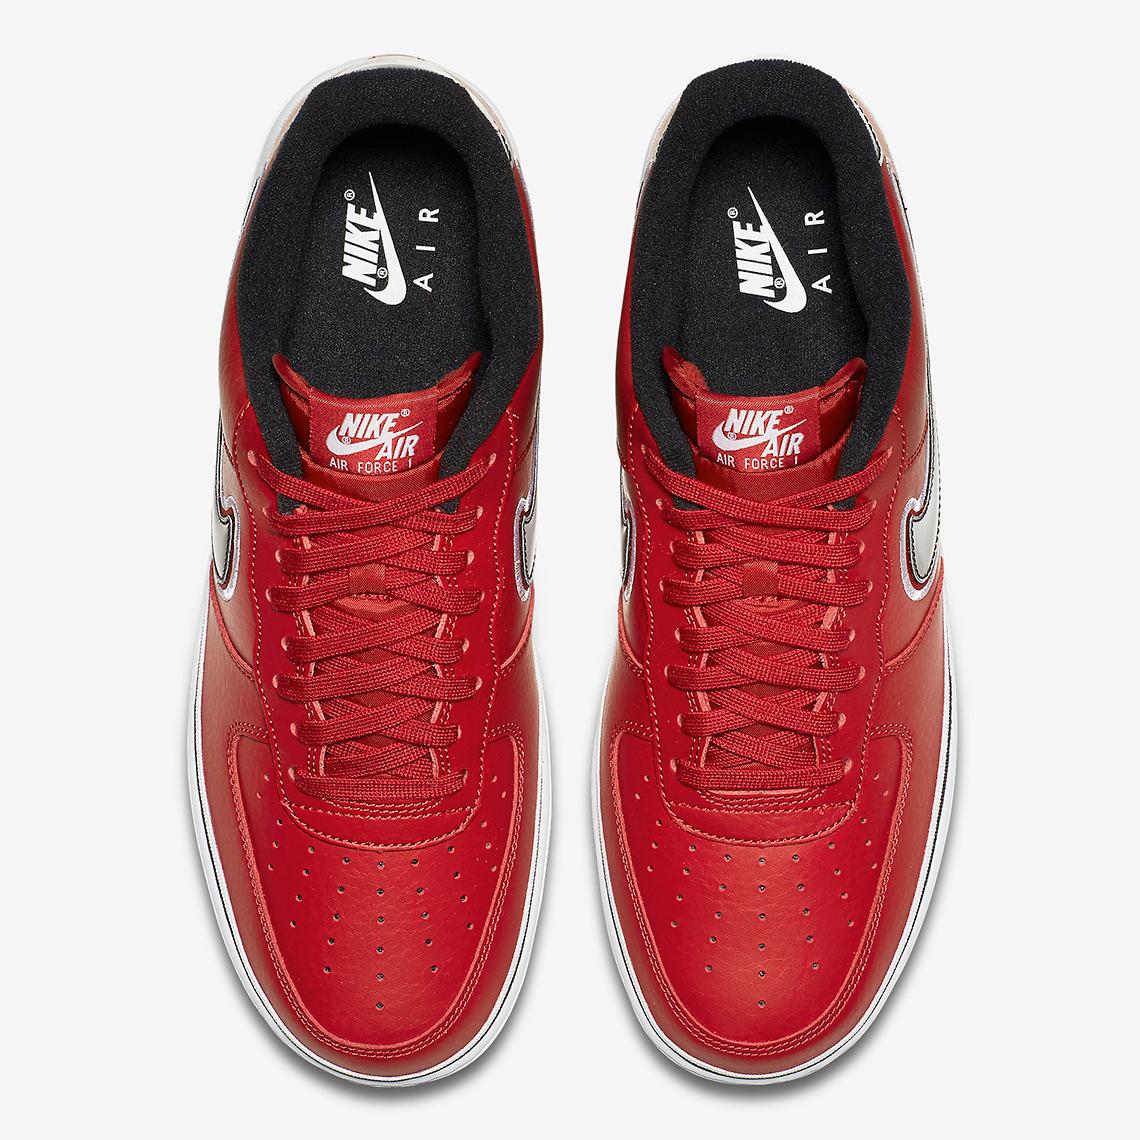 nike air force 1 bulls 6 - The Chicago Bulls Get Their Own Nike Air Force 1